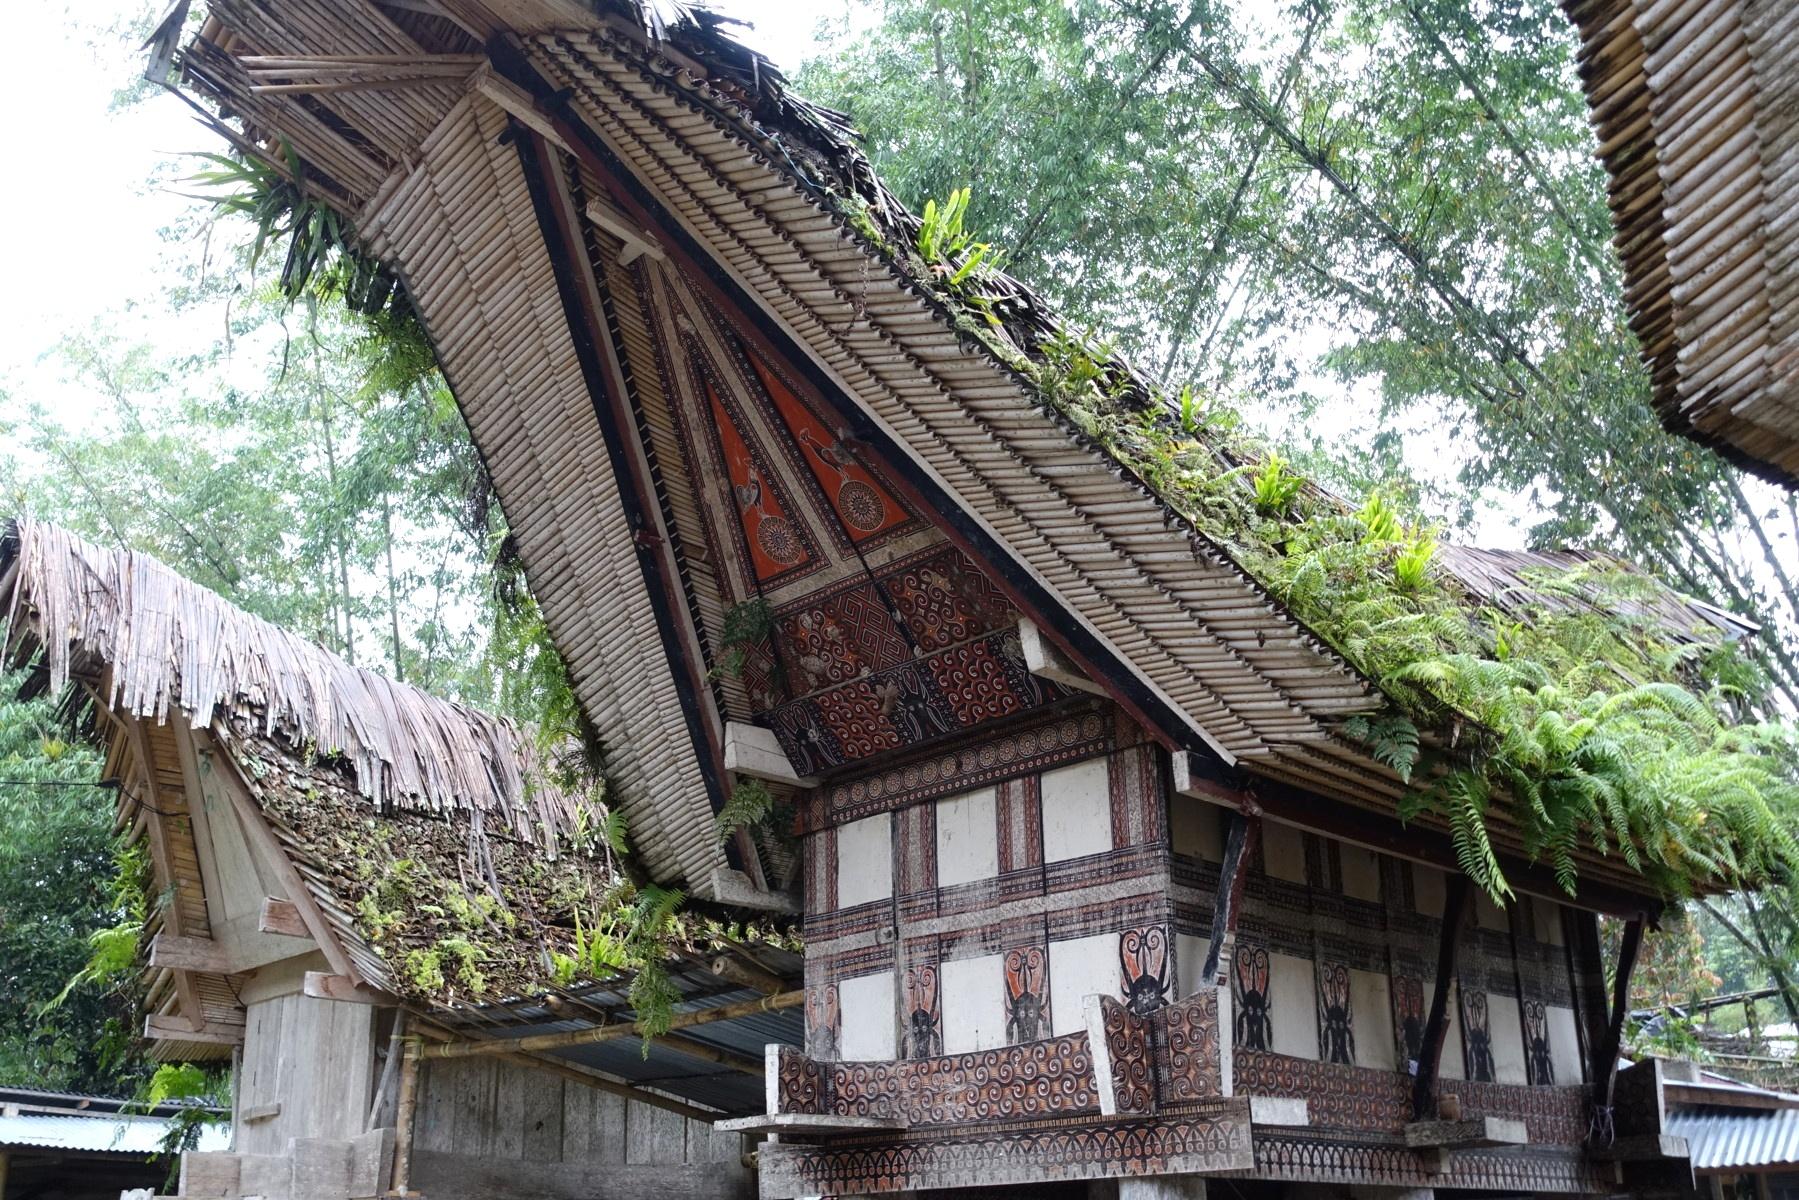 Indonesie_Sulawesi_Toraja_Rantepao DSC05151